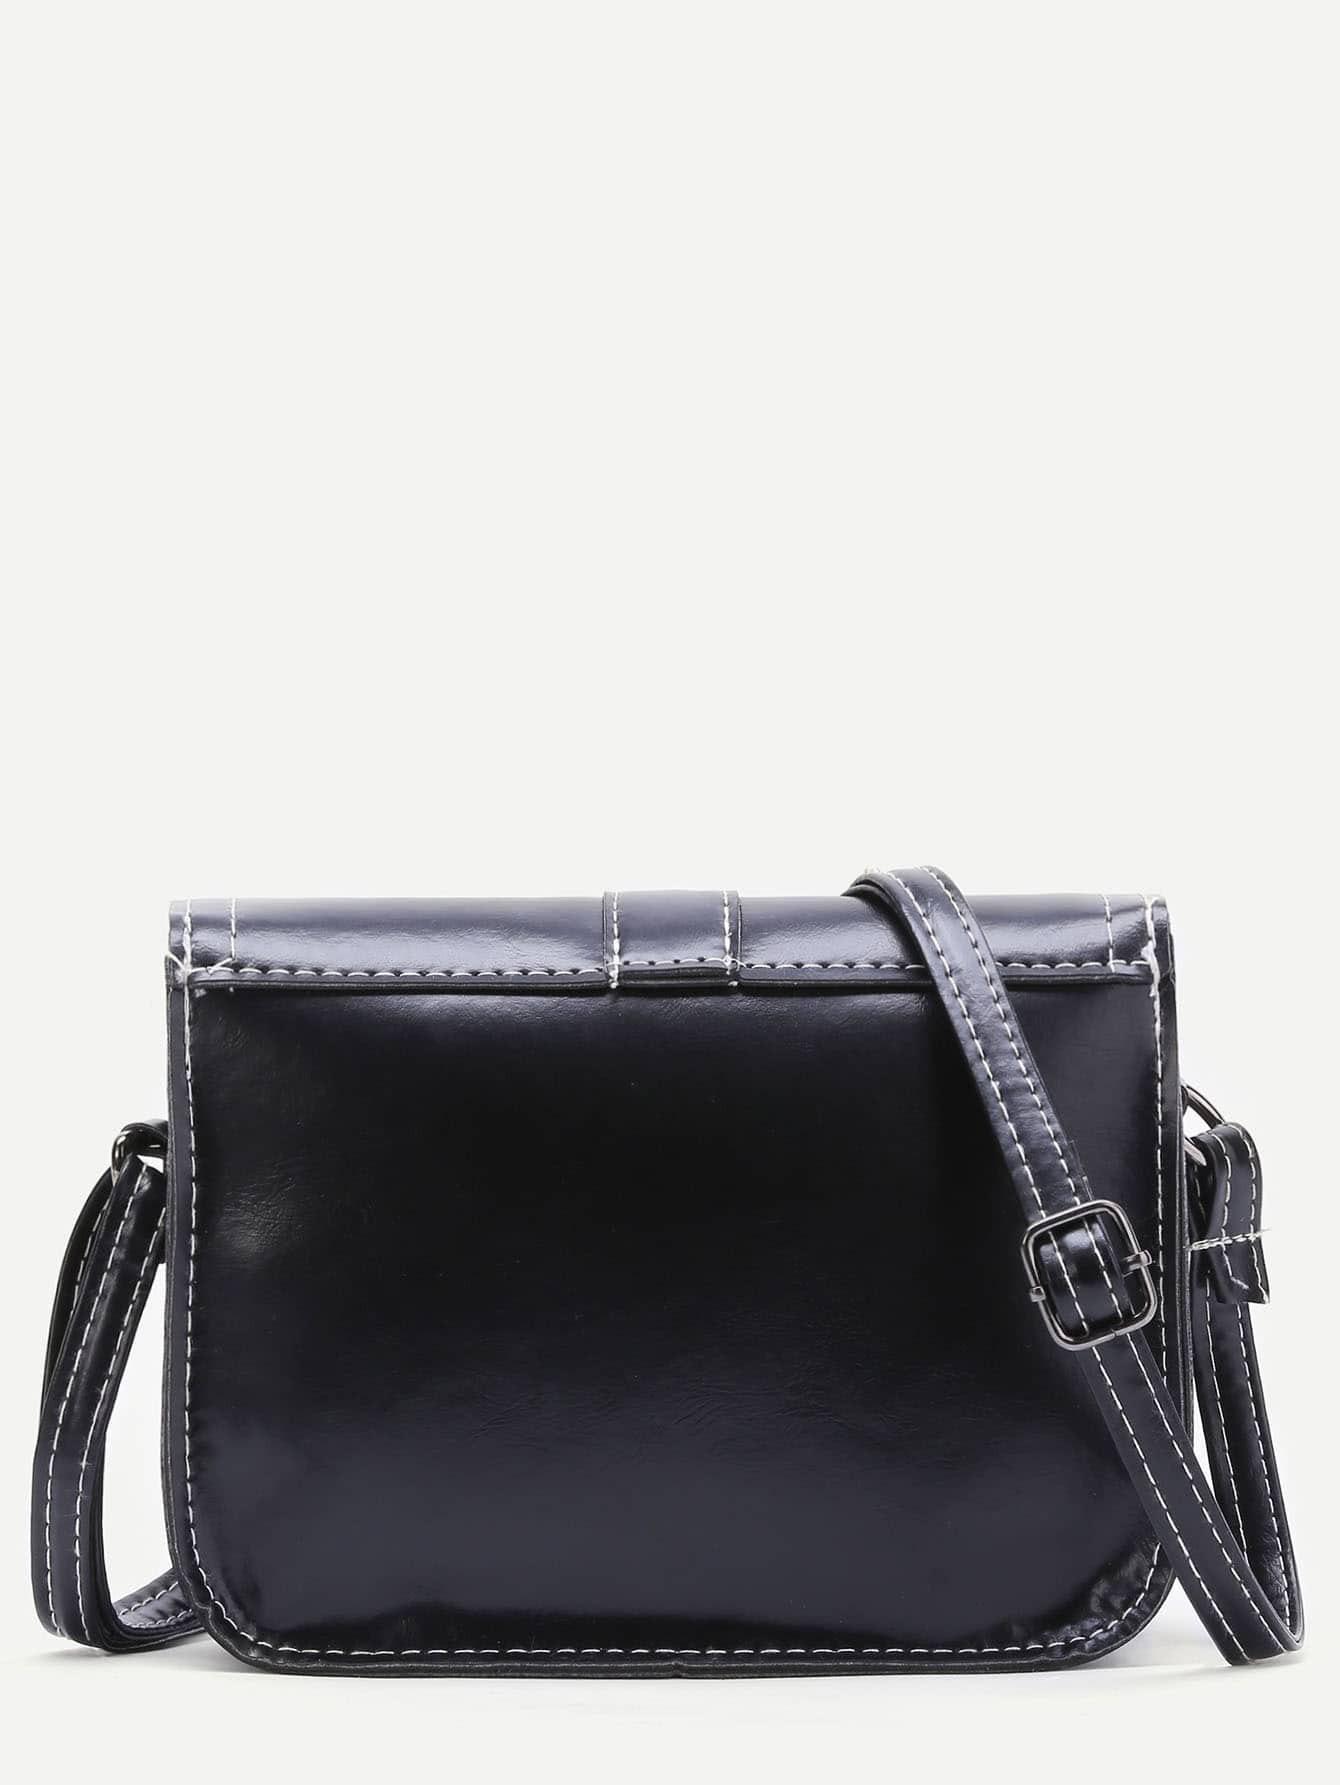 bag170217301_1